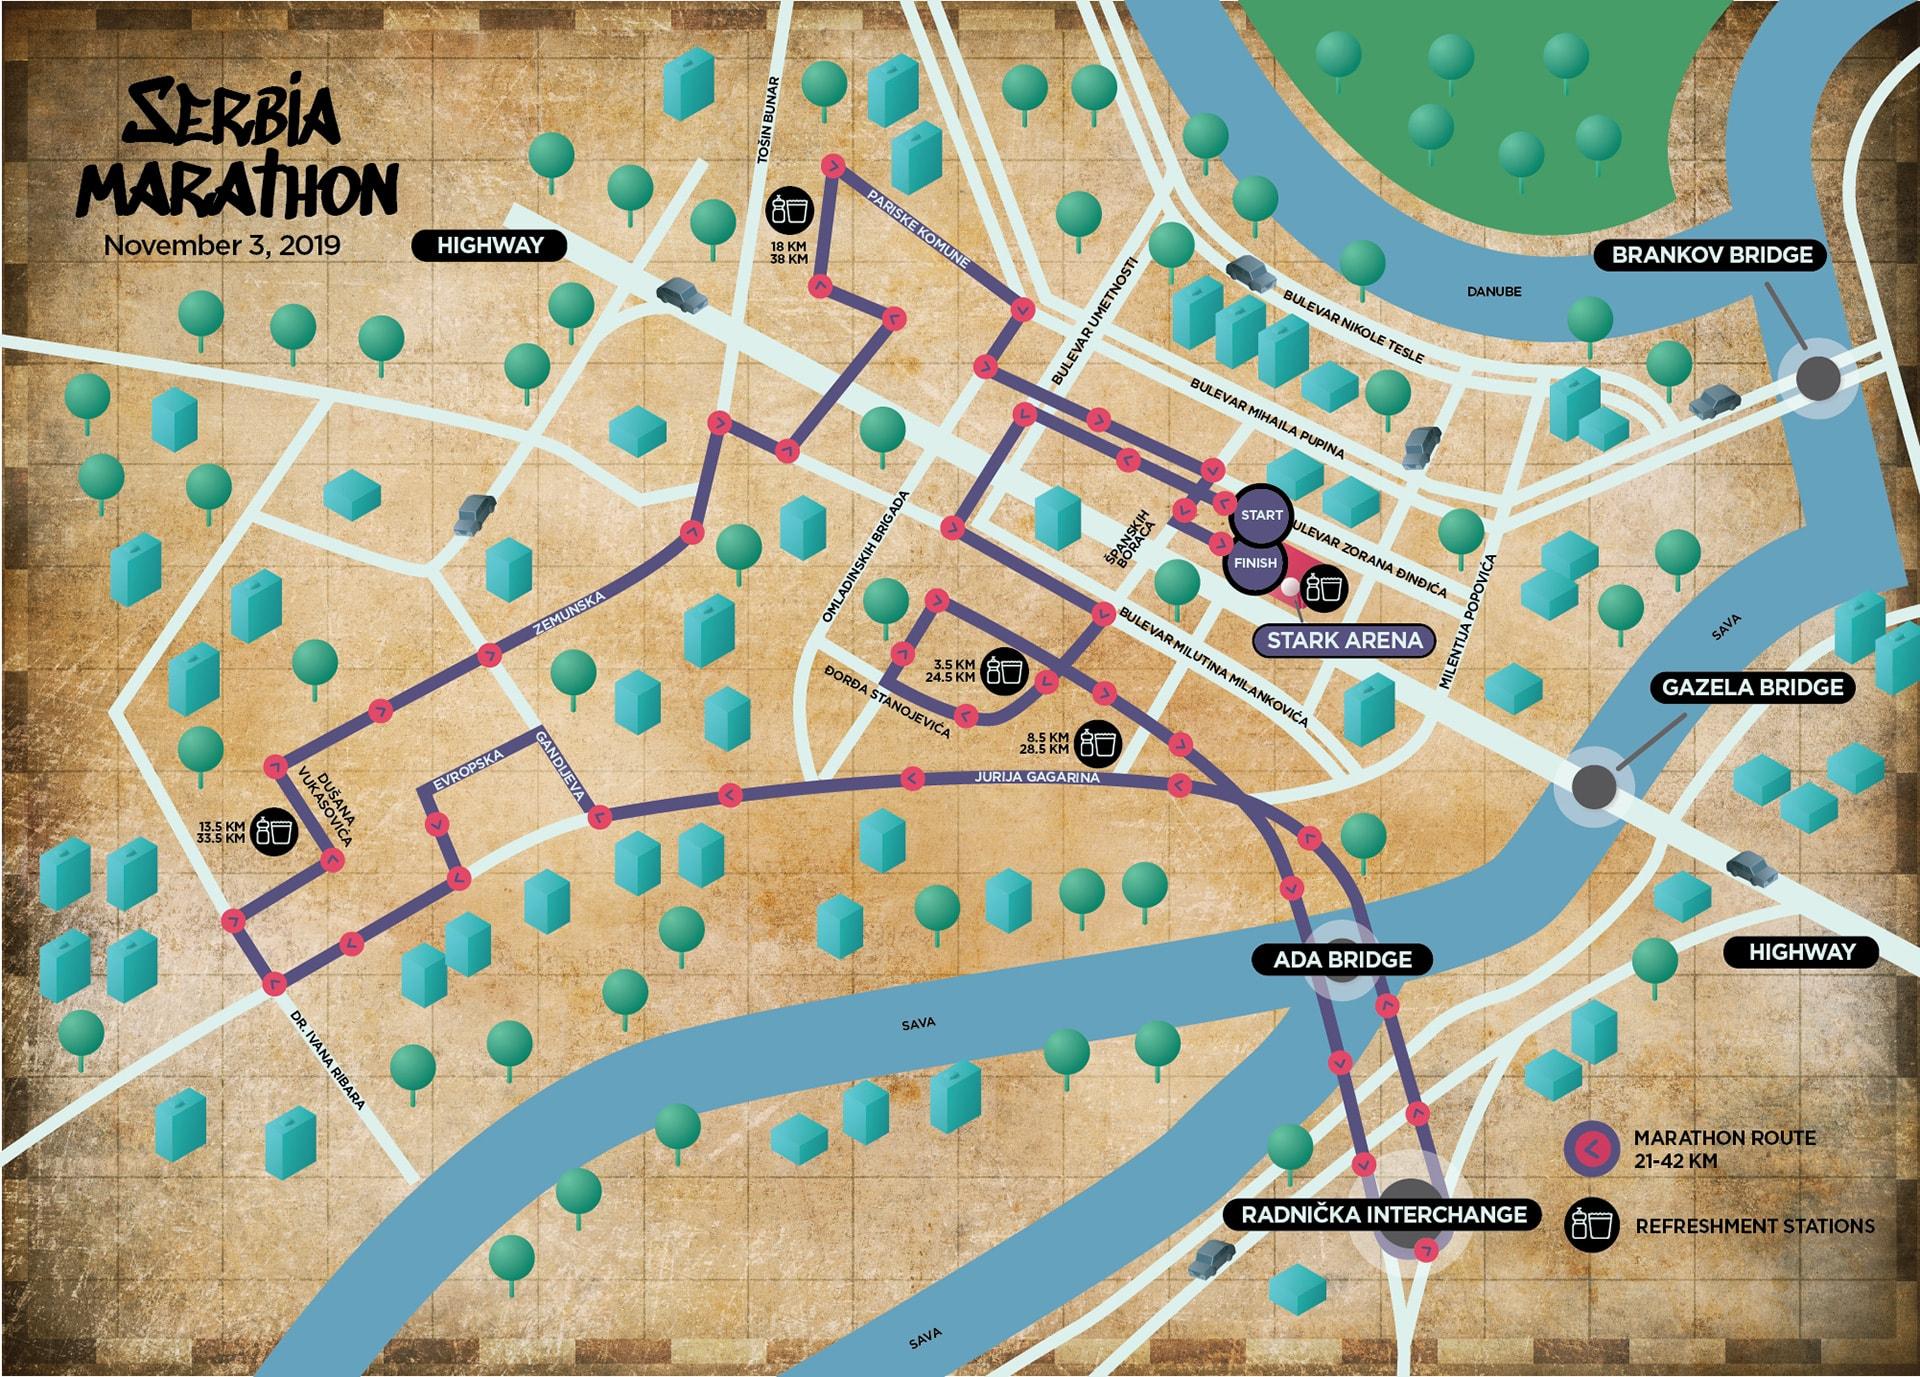 Serbia Marathon mapa